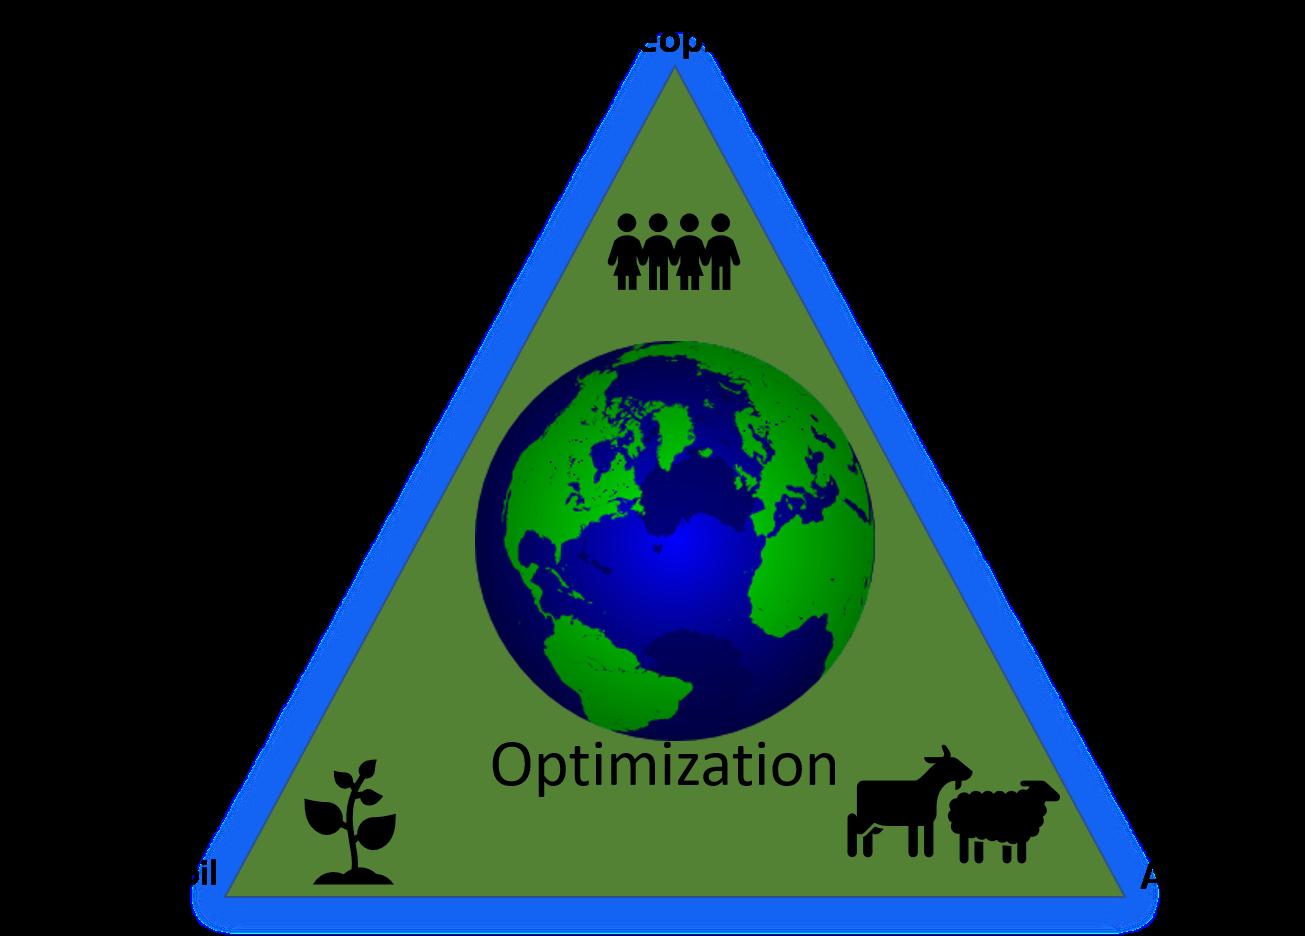 optimizationtriangle3